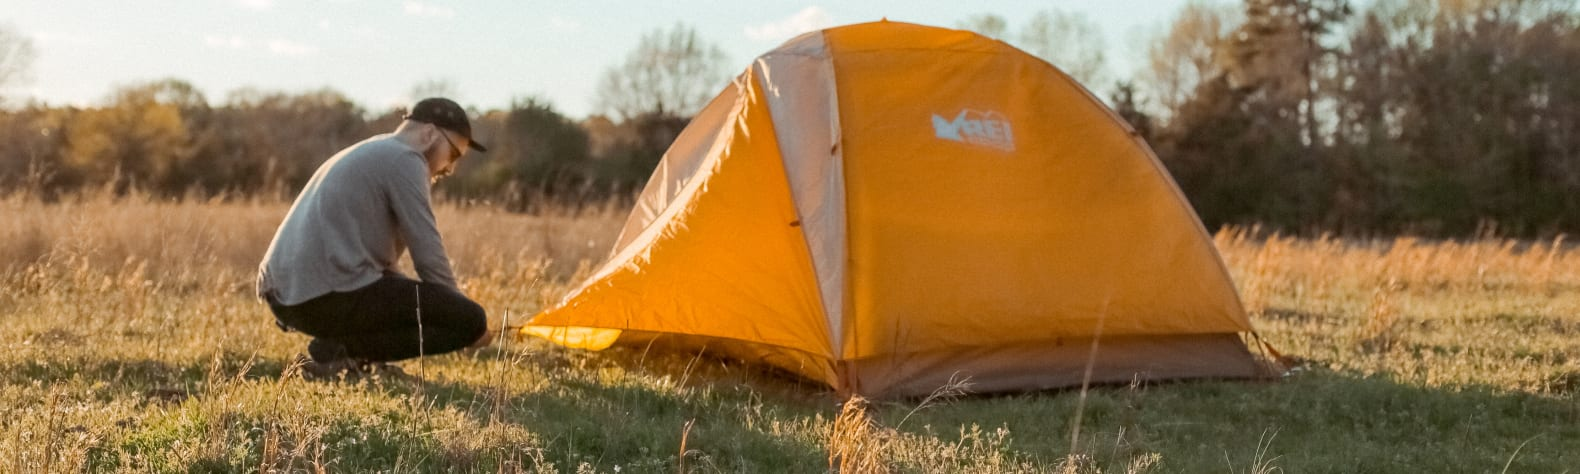 Camp Clatworthy